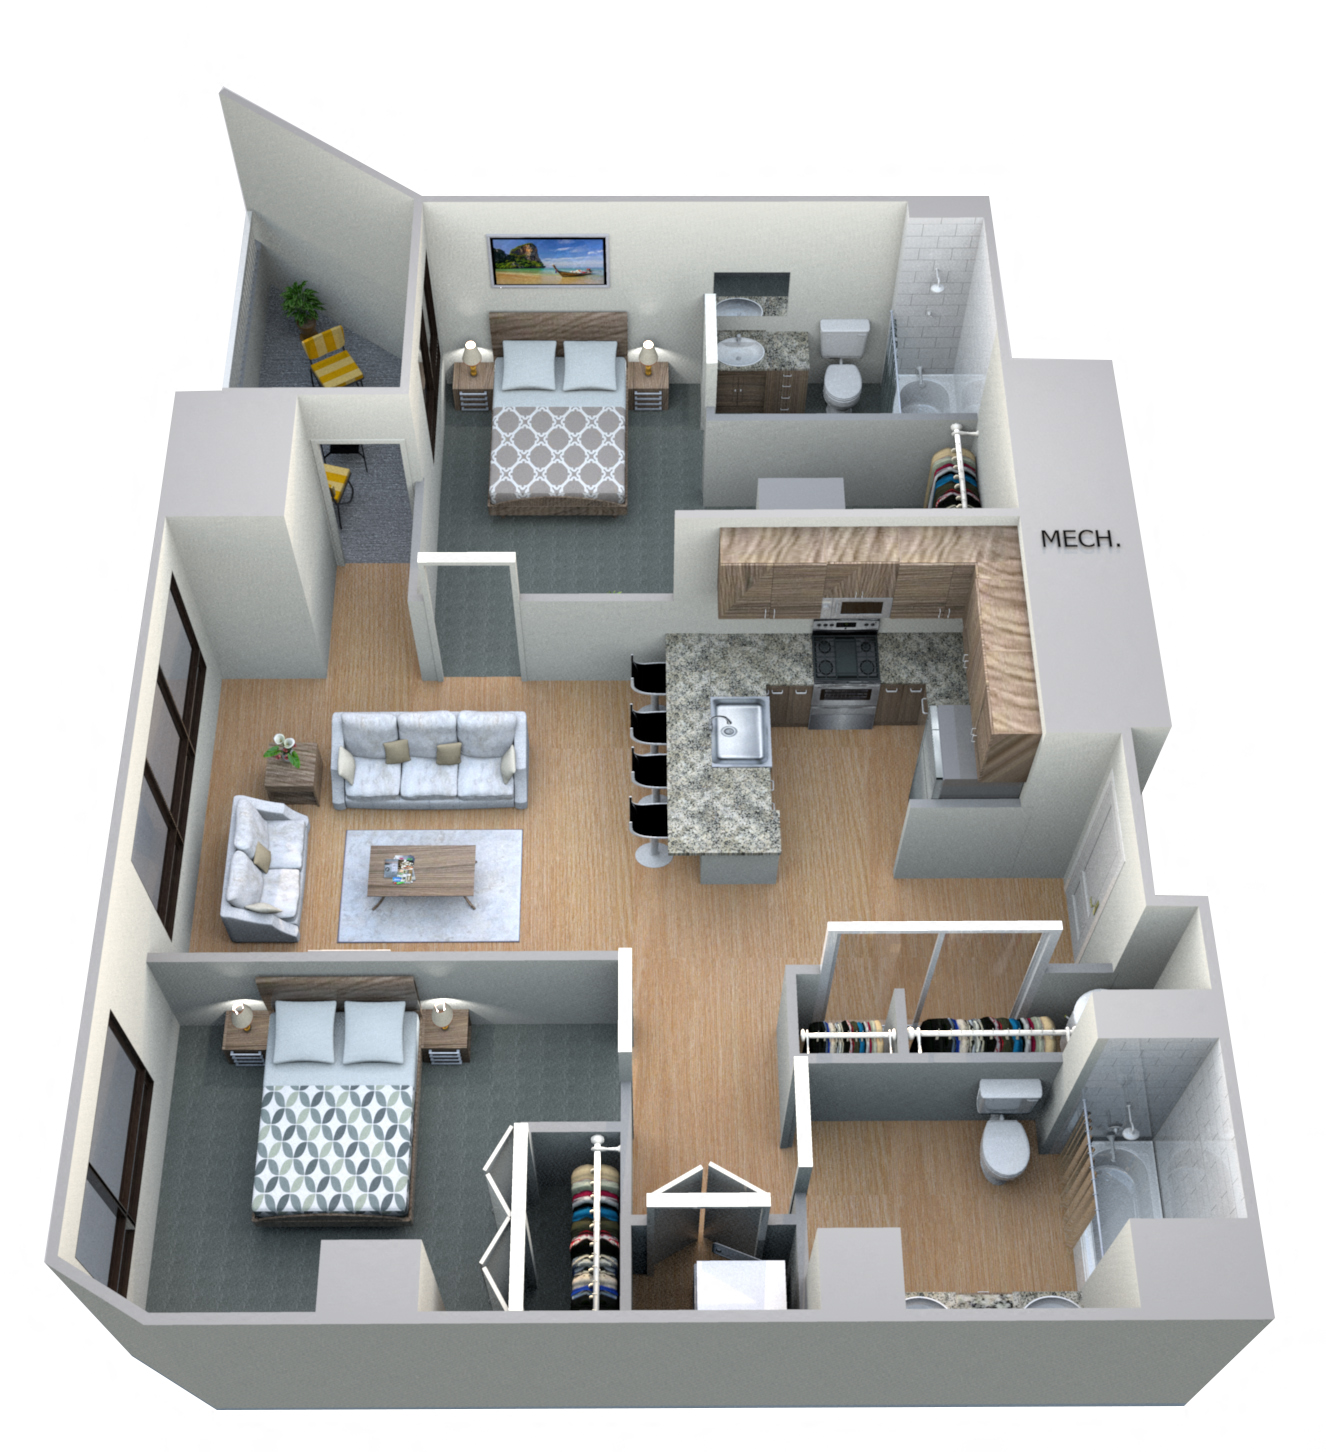 Floor Plans Of M Apartments In Spokane, WA